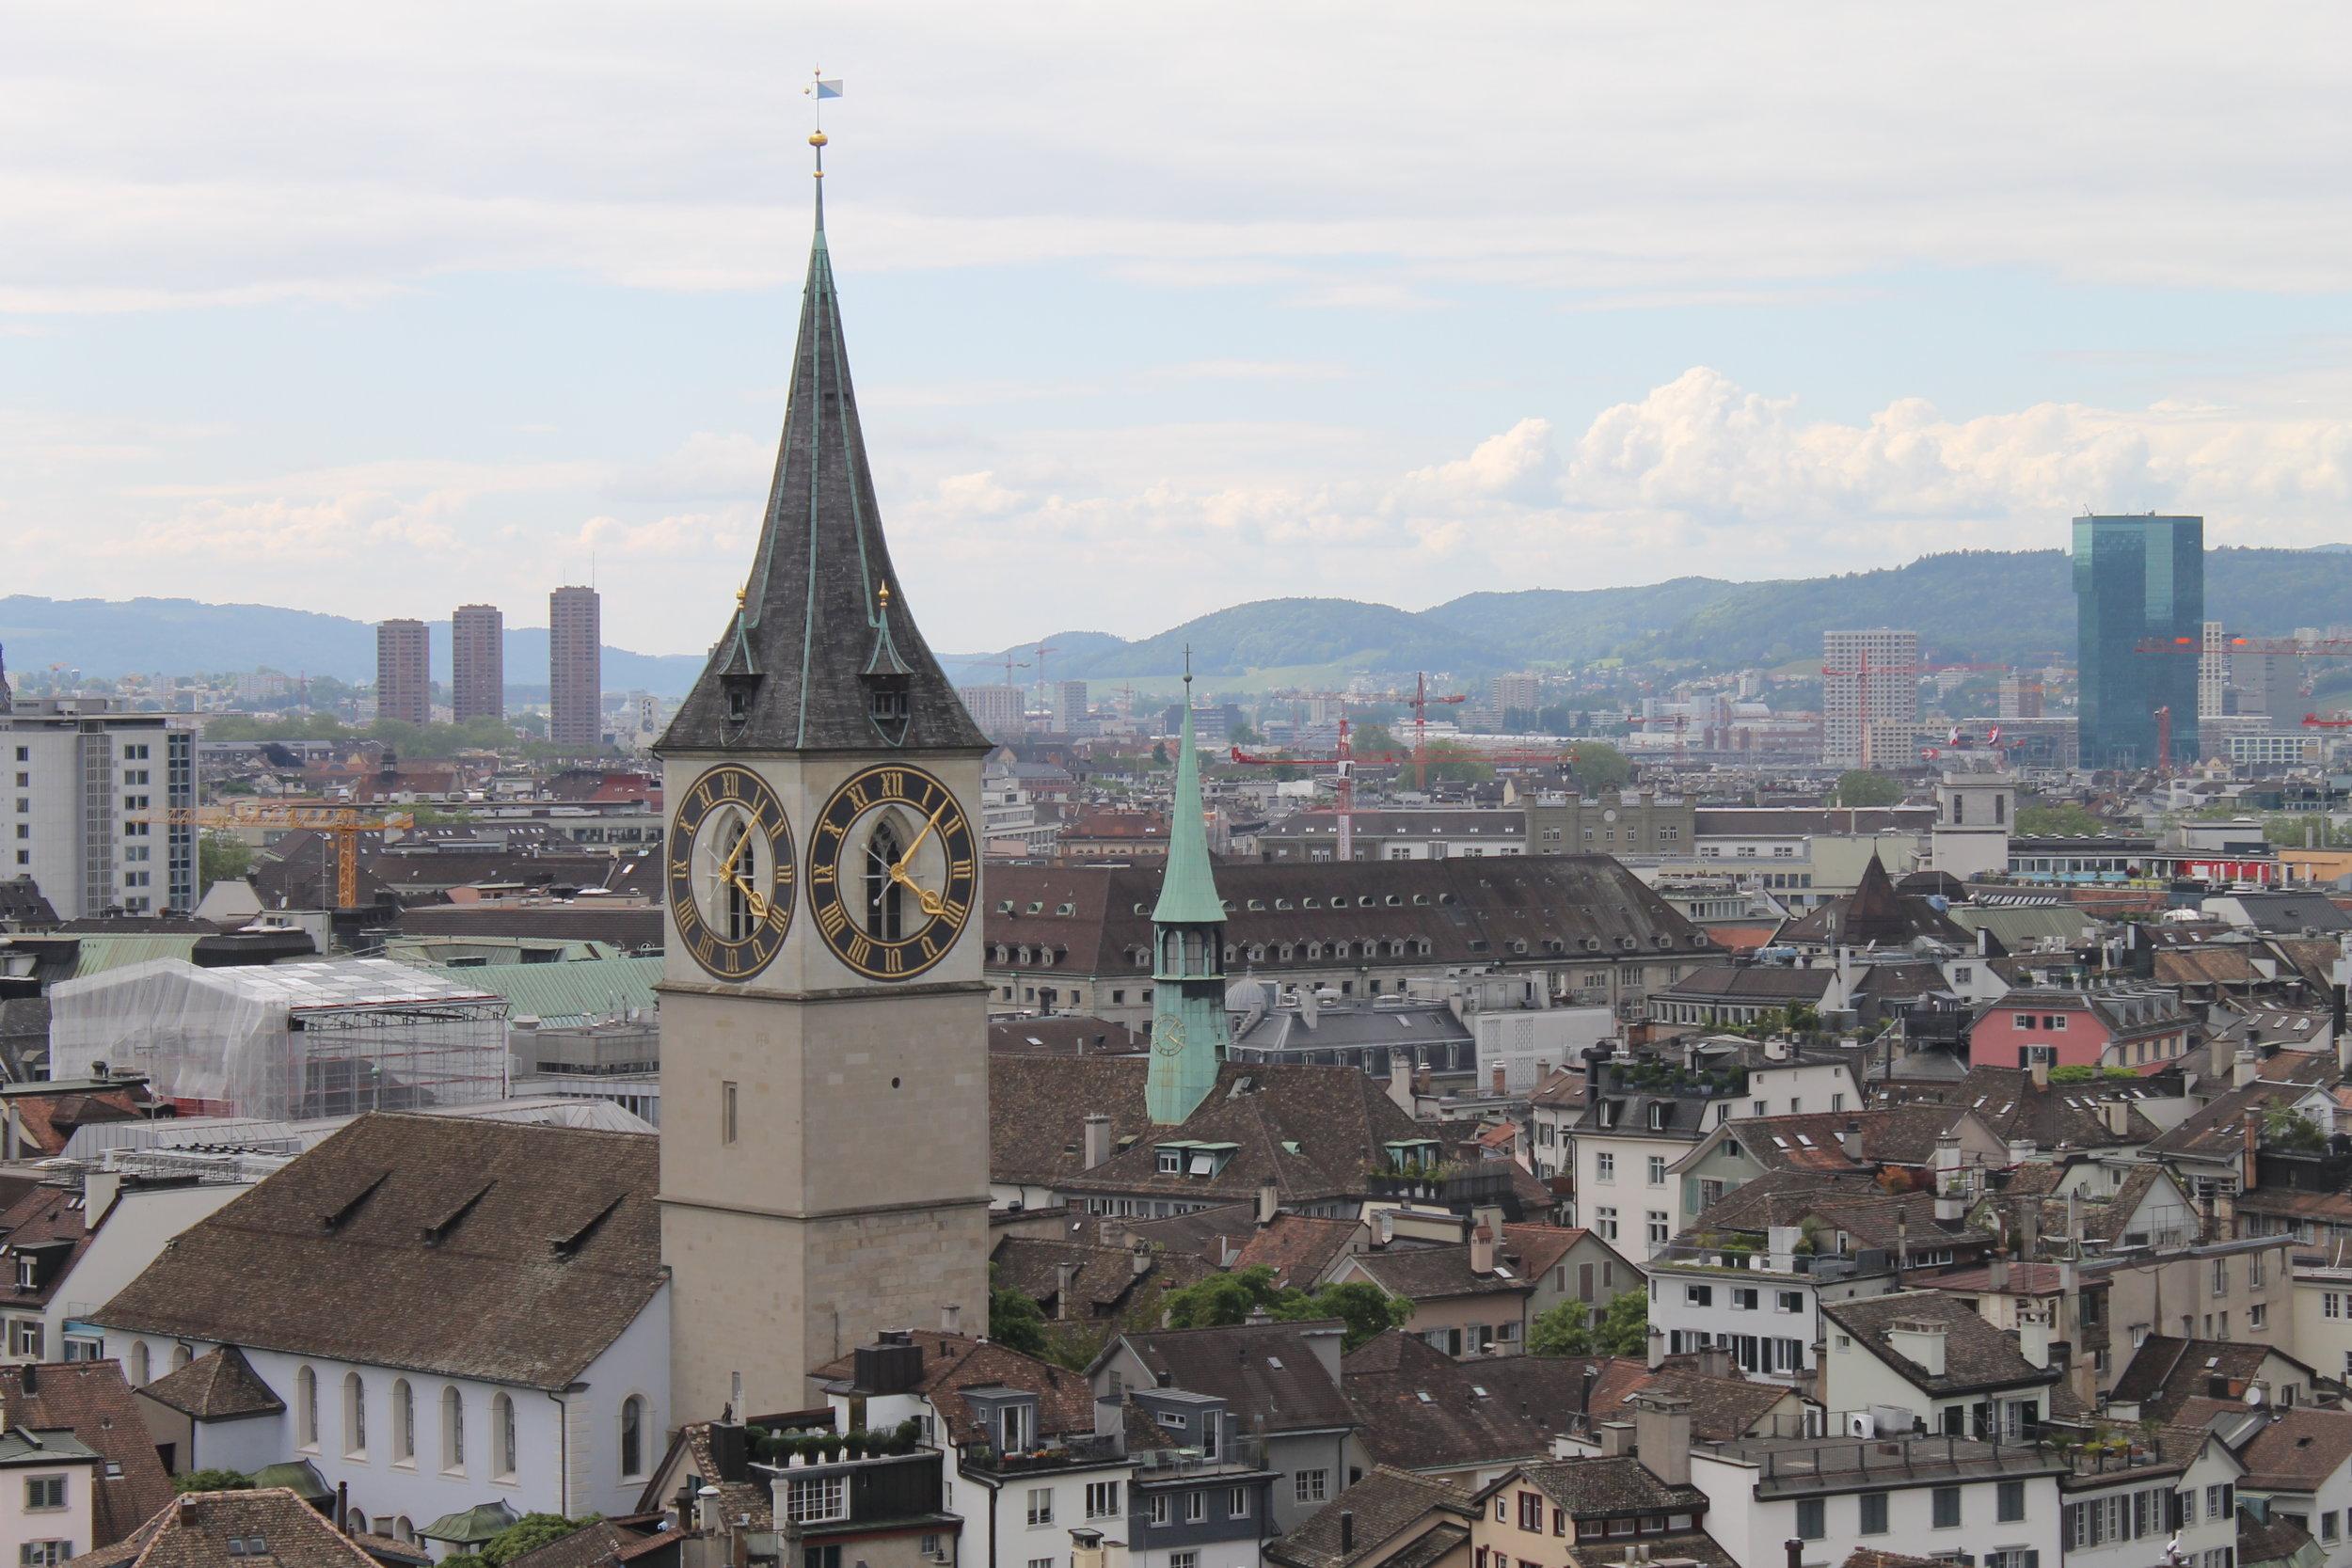 View from Grossmünster